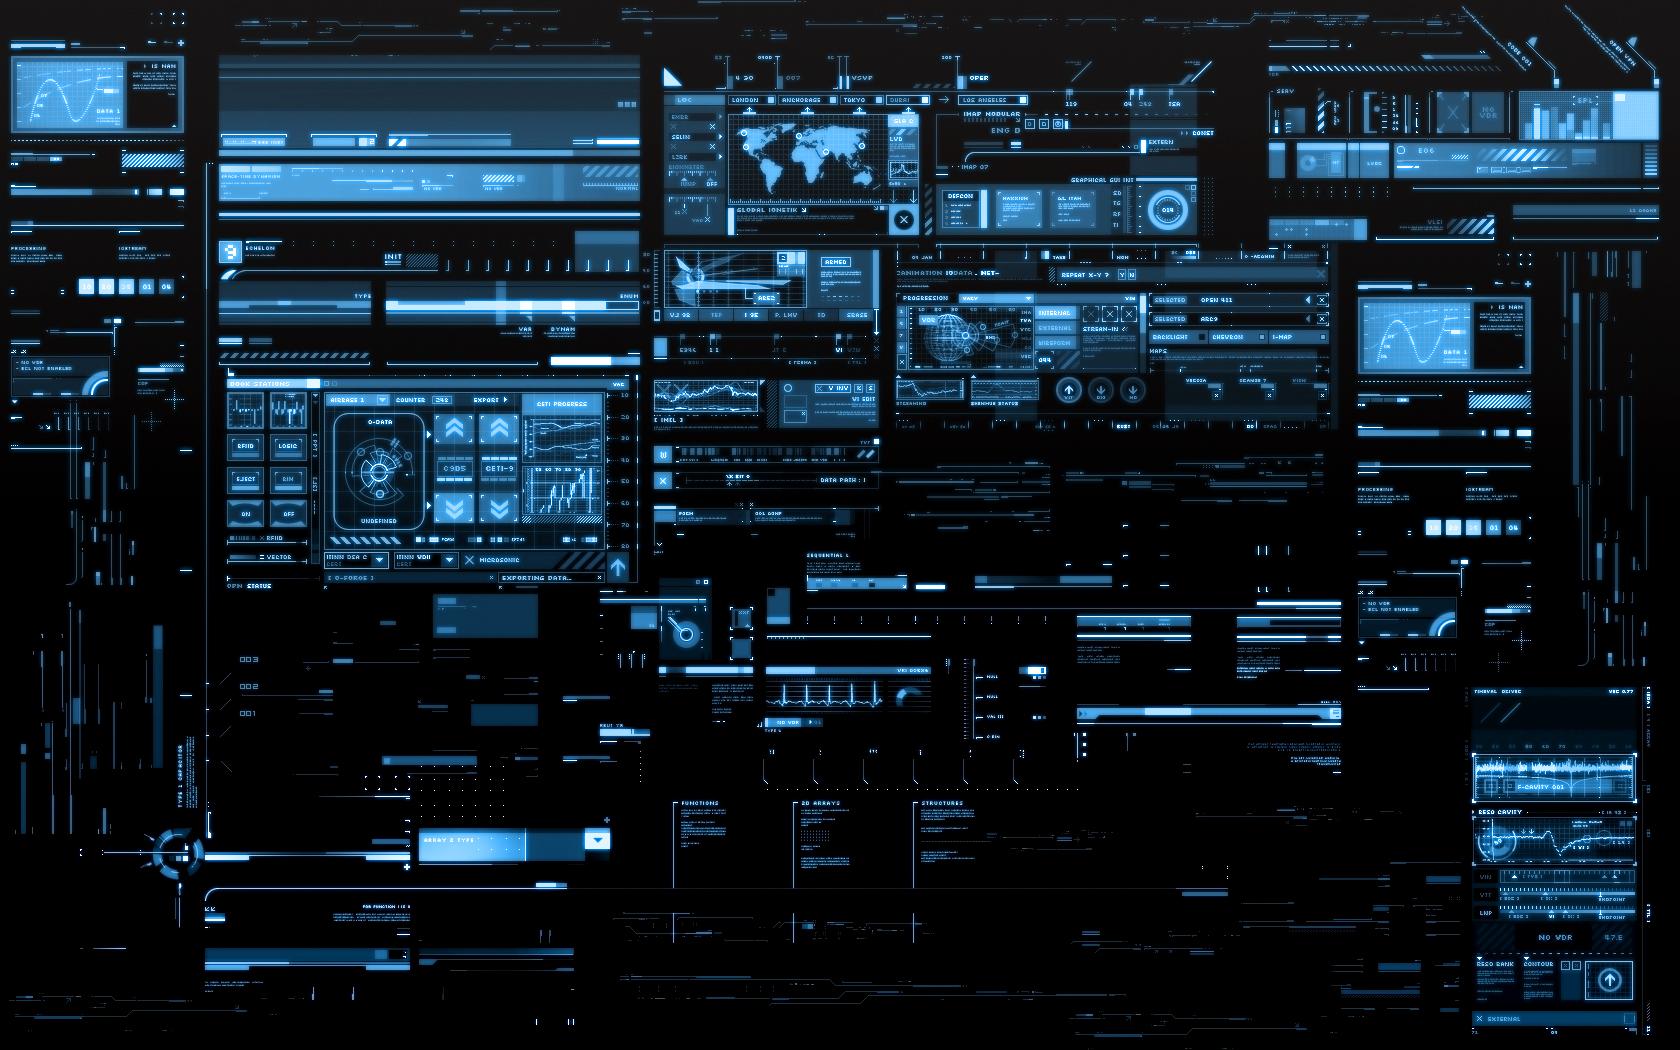 Free Download Hd Desktop Technology Wallpaper Backgrounds